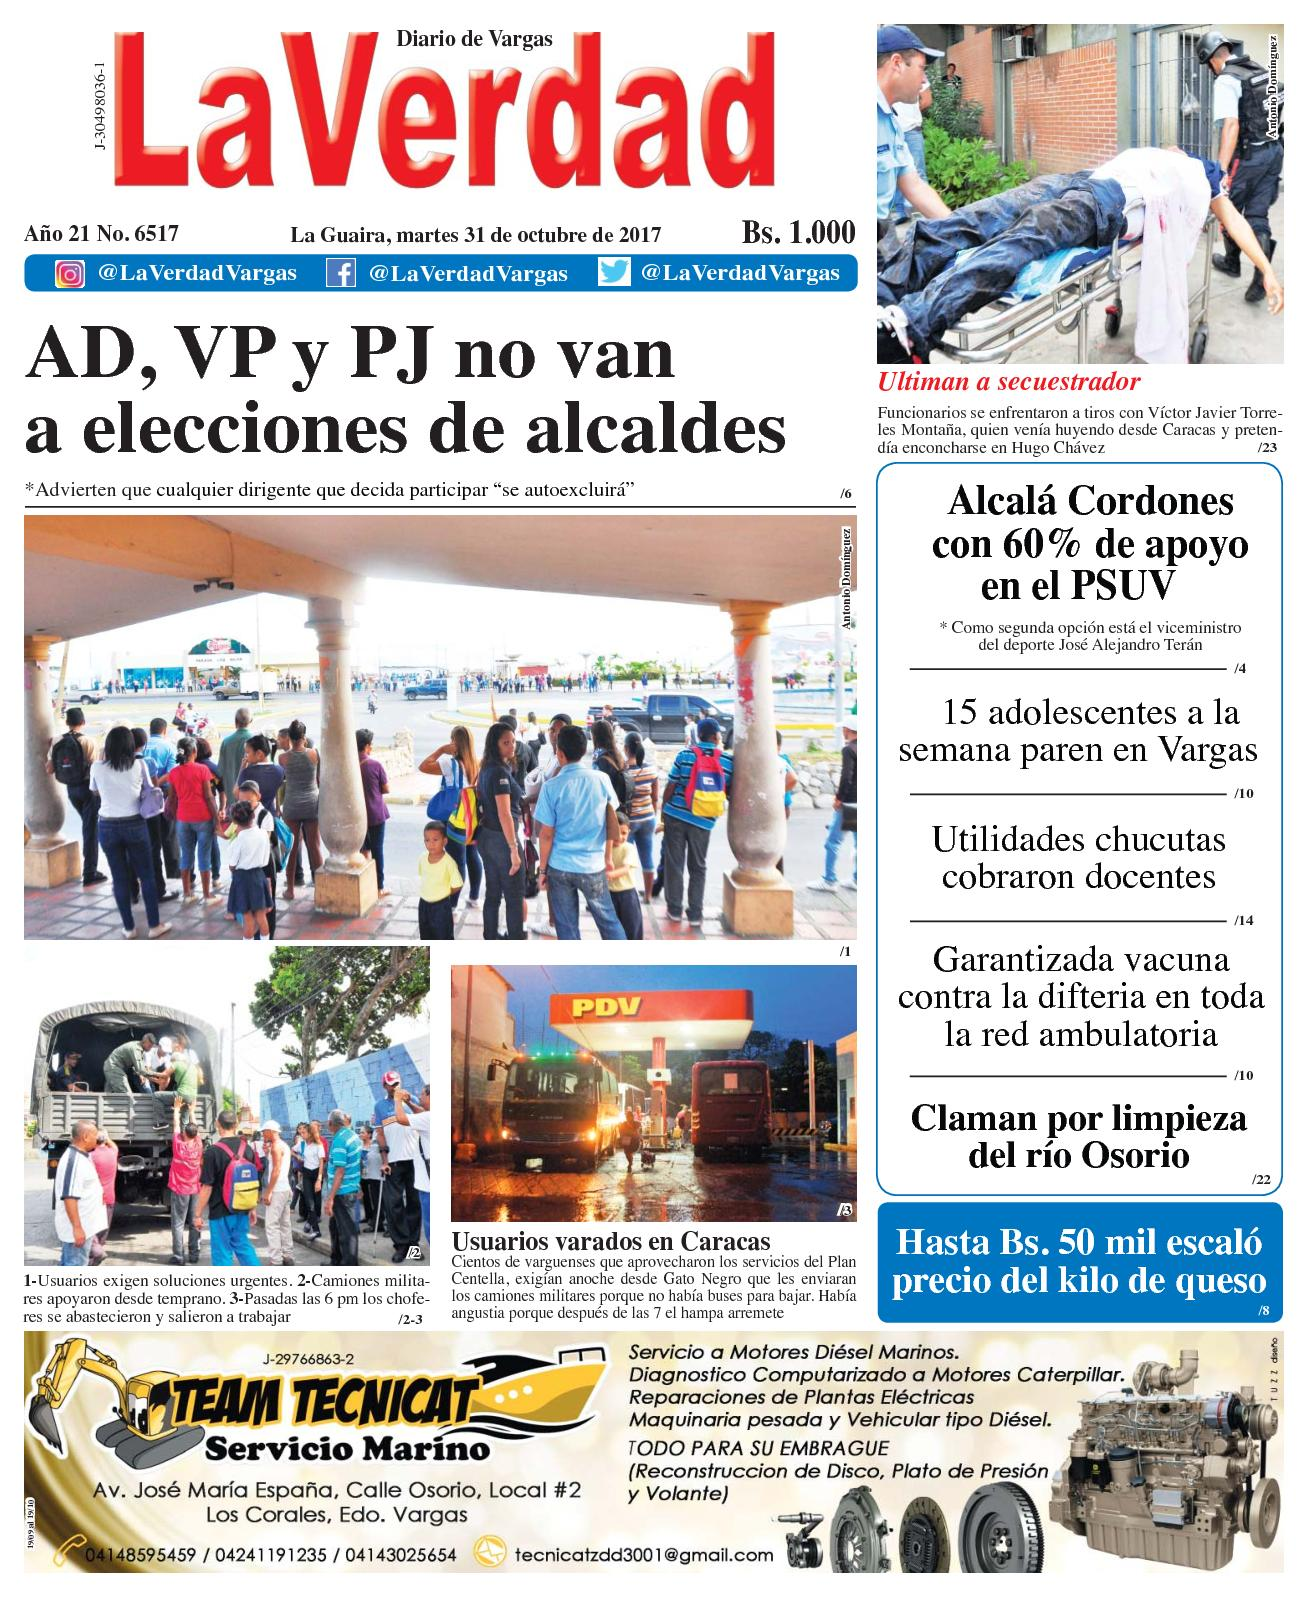 La Guaira, martes 31 de octubre de 2017. Año 20 No. 6517